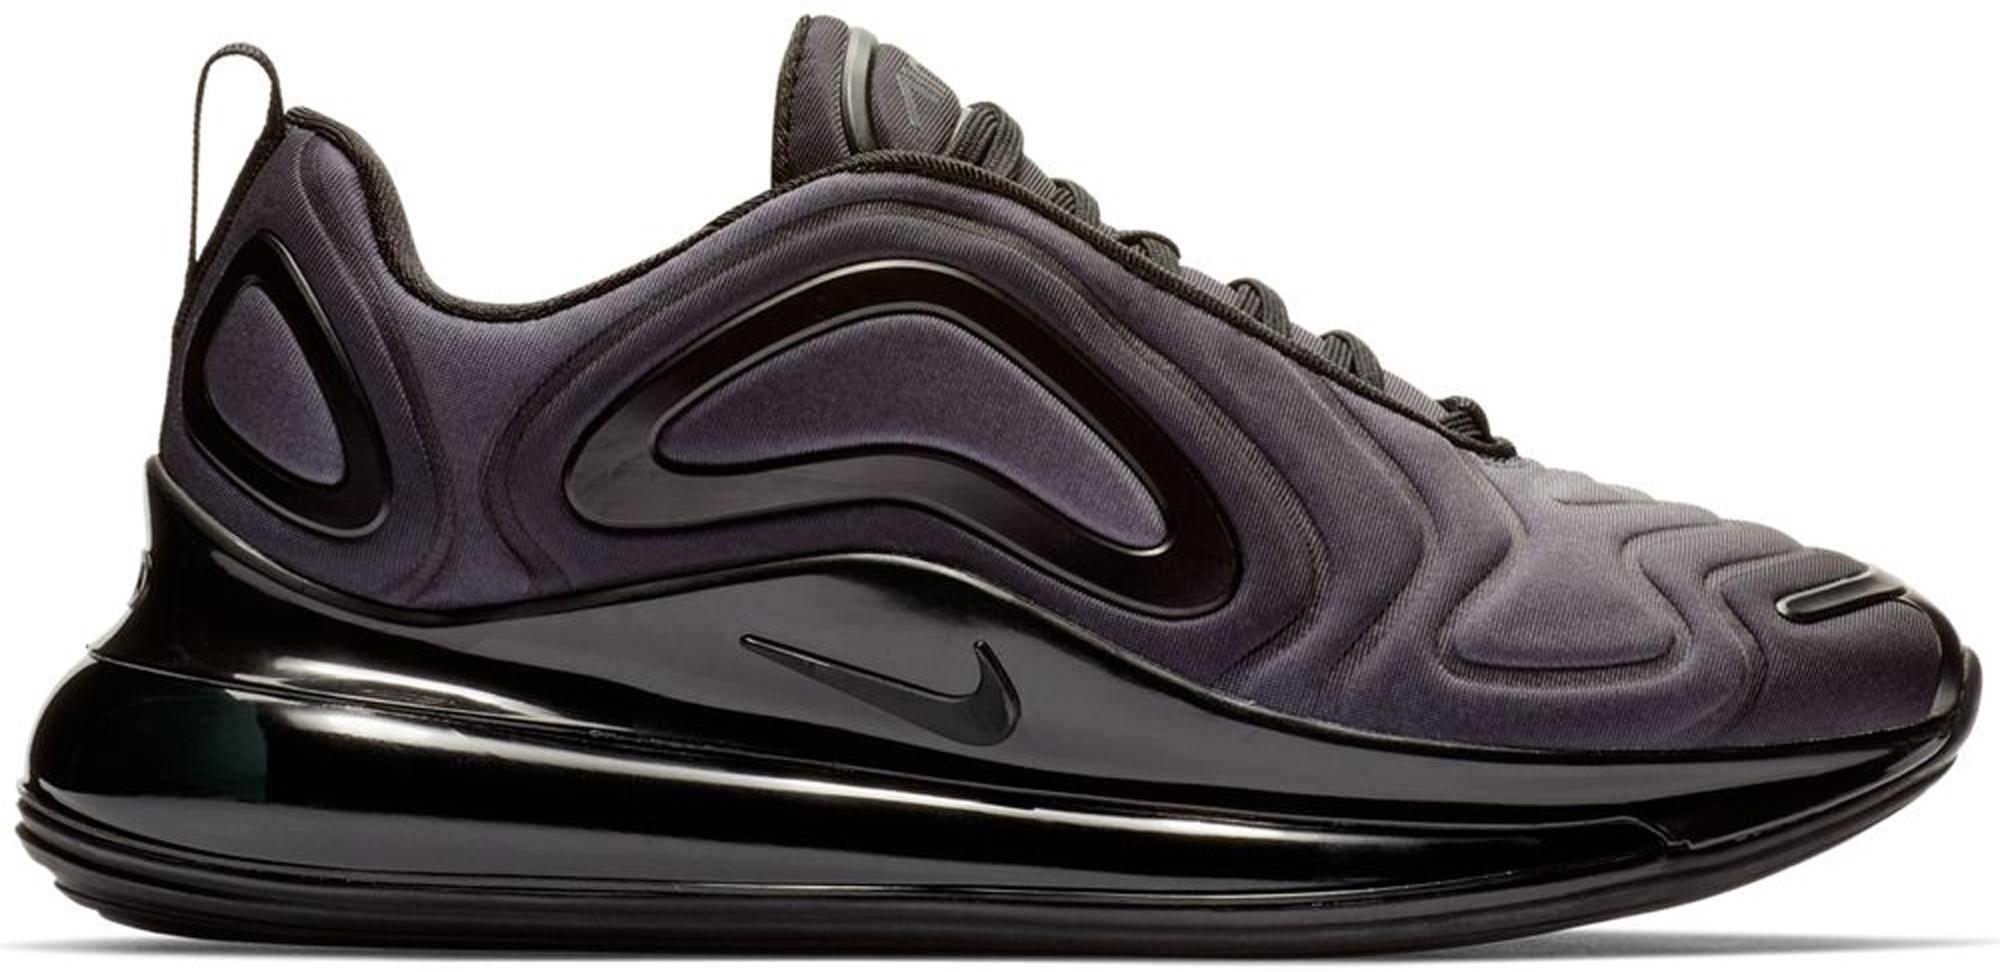 Nike Air Max 720 Black Anthracite (W